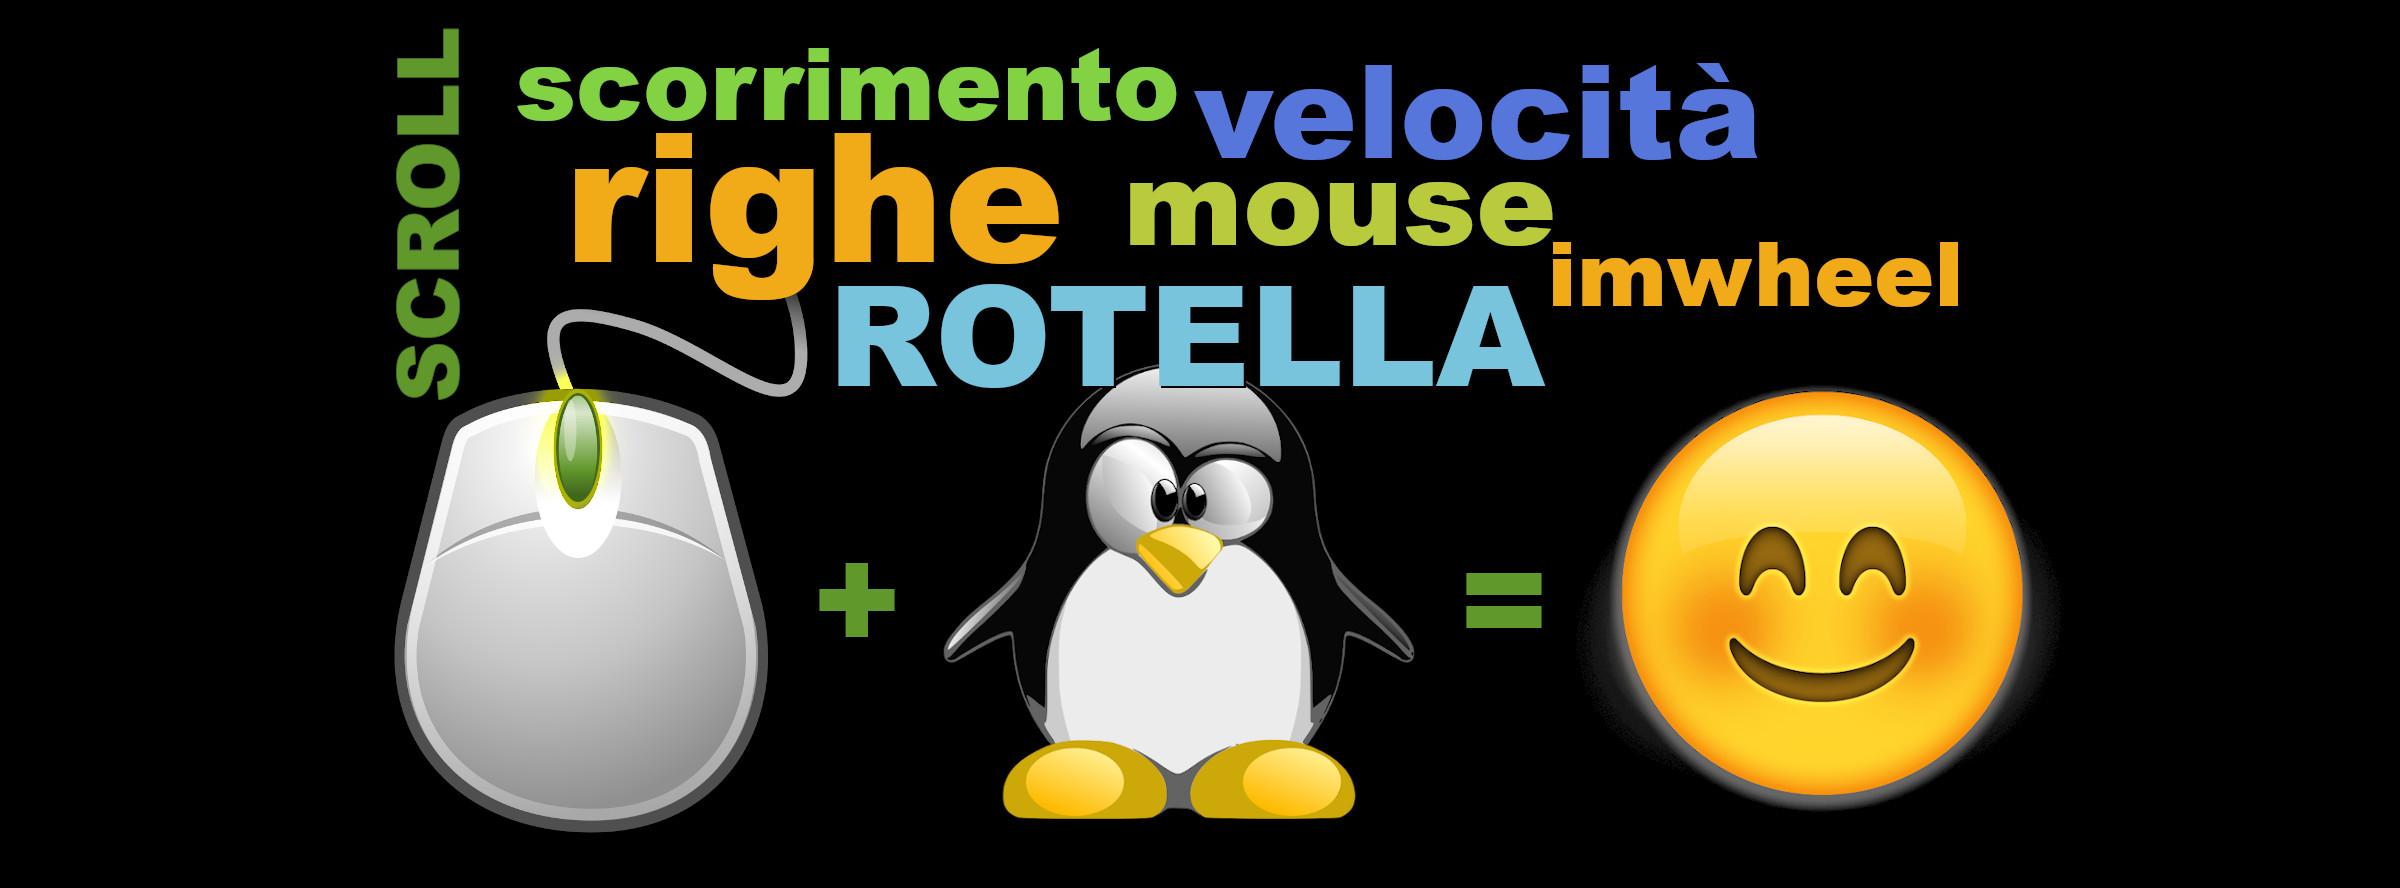 rotella mouse mousewheel imwheel linux